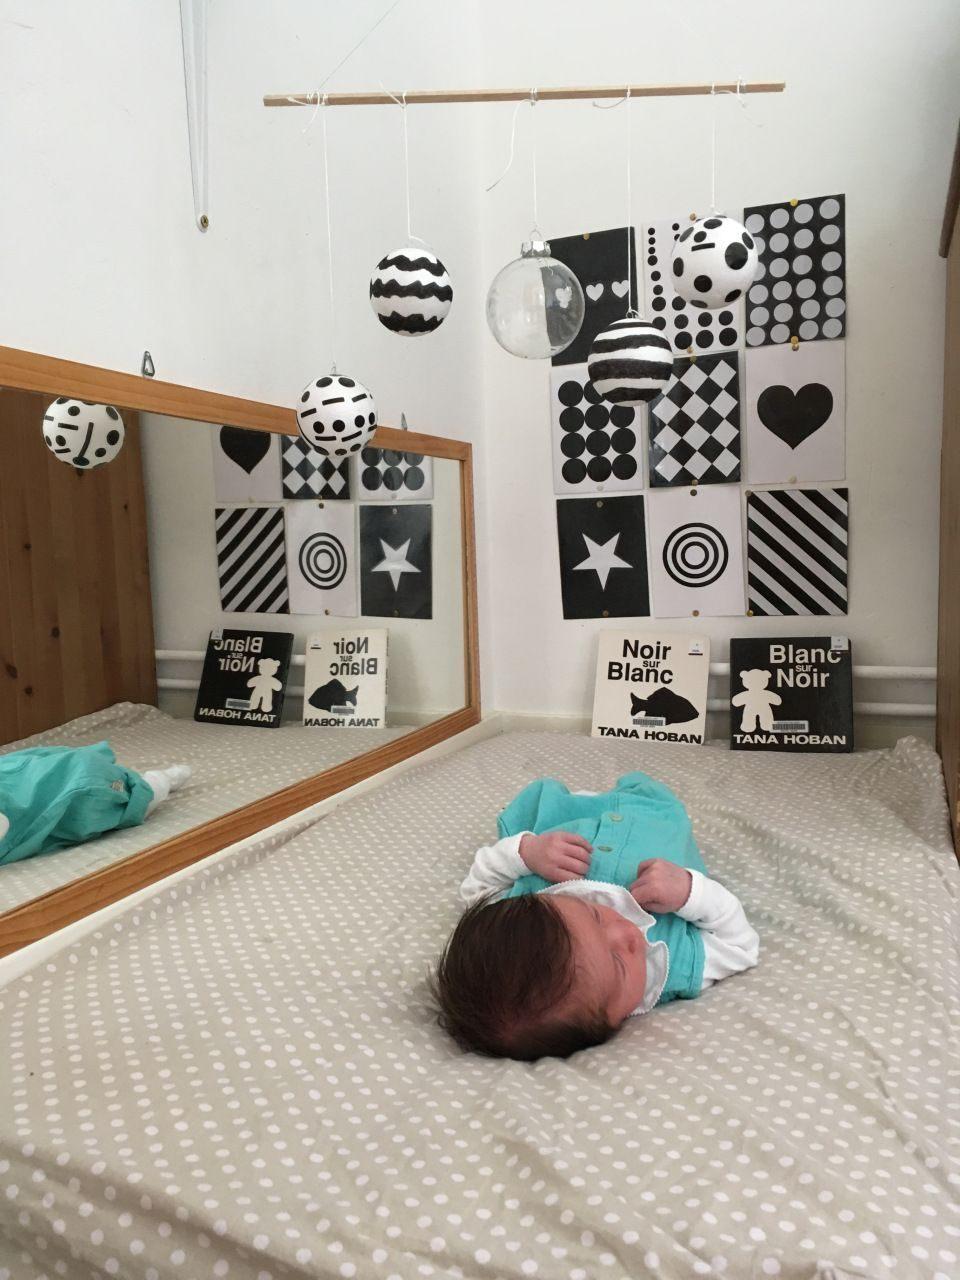 Lit Montessori Bébé 9 Mois Inspirant Chambre Enfant Montessori